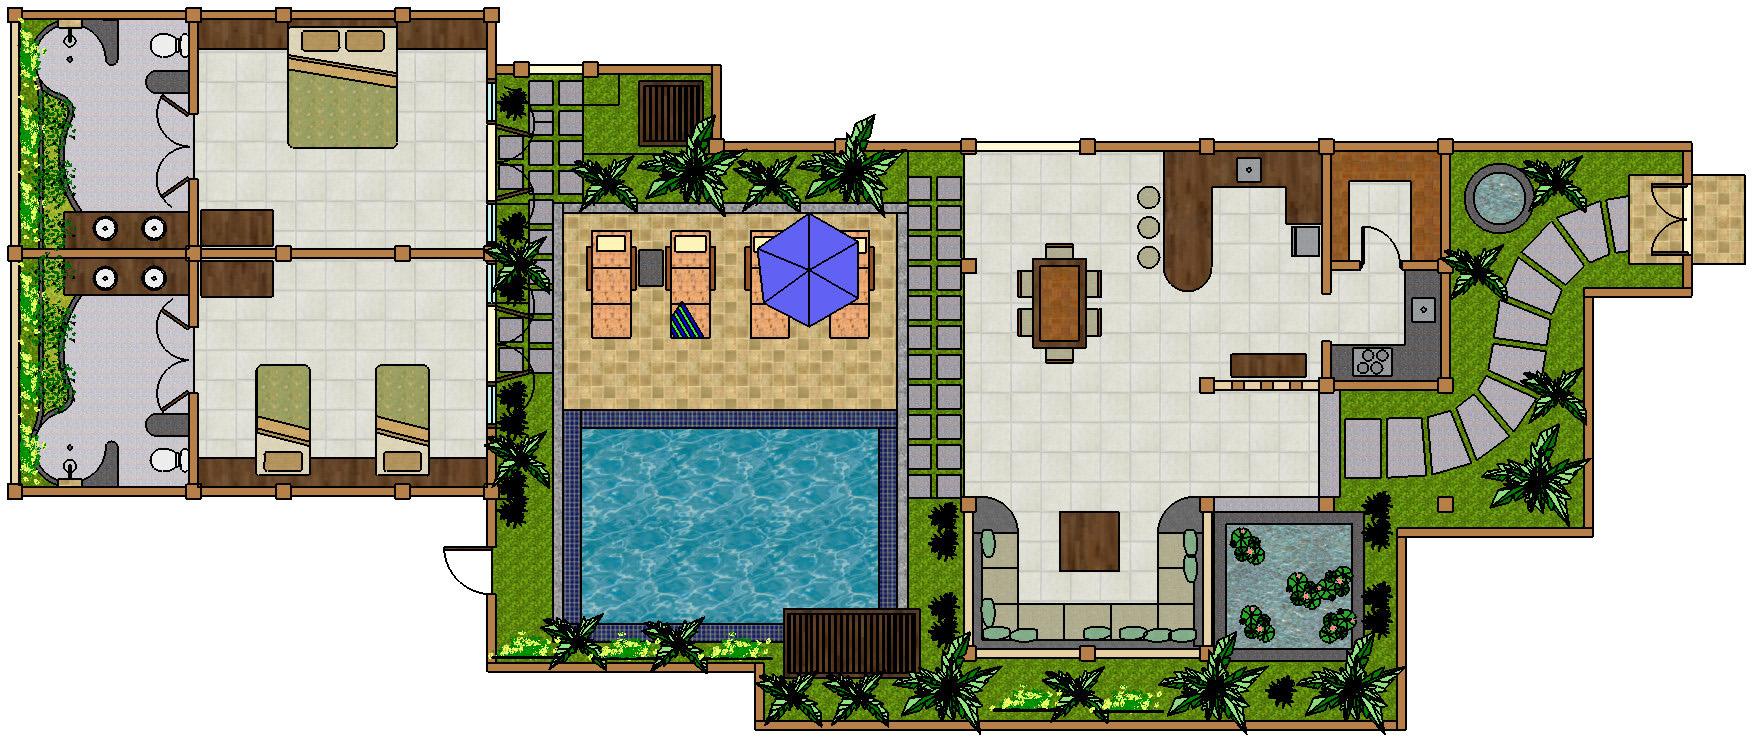 deluxe 2 bedroom - villa teman lovina bali - floorplan